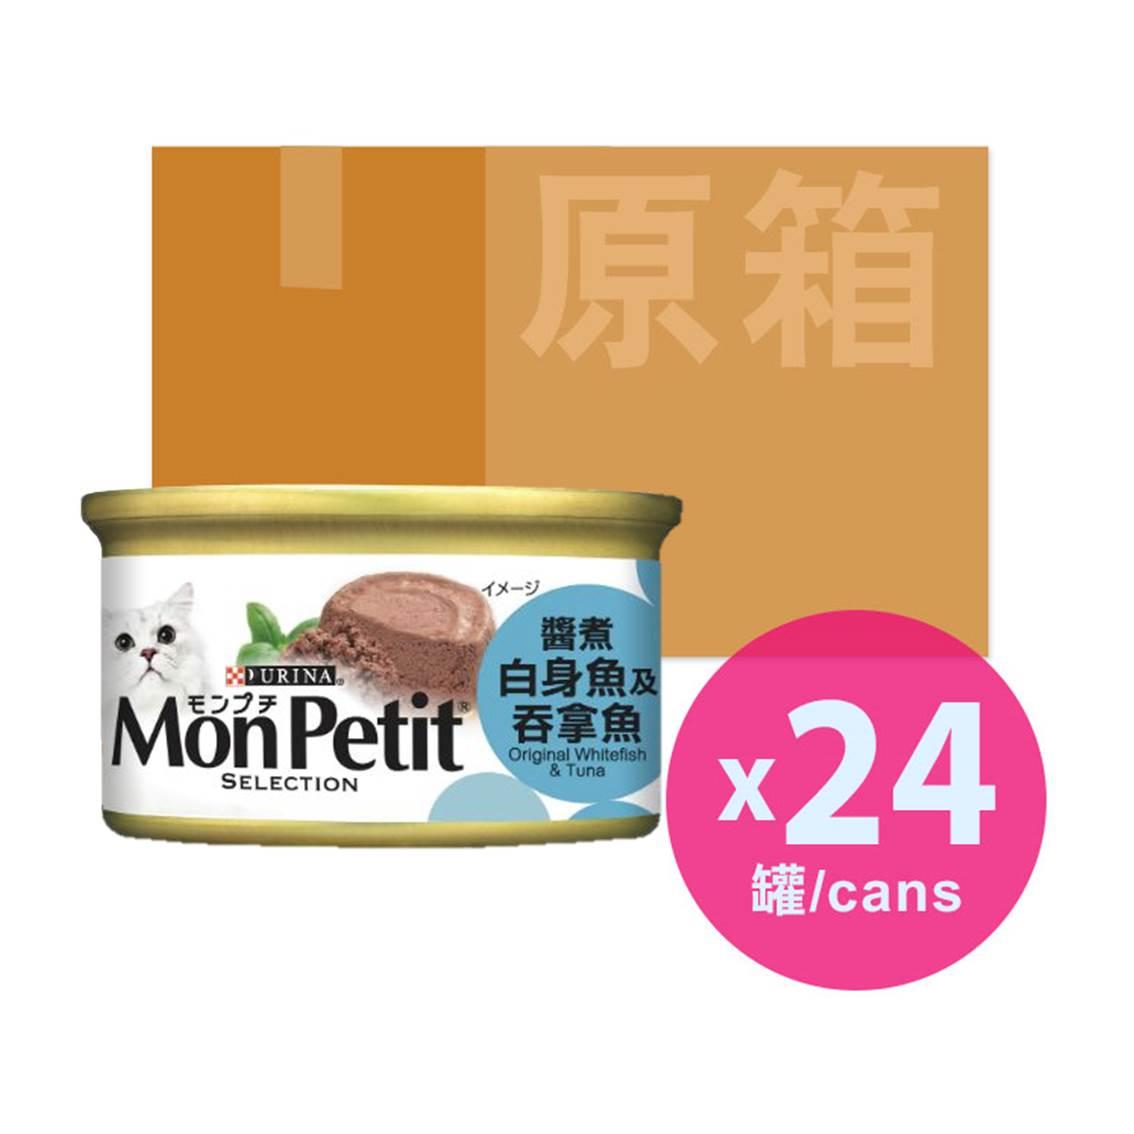 MON PETIT原箱至尊醬煮鱈魚及吞拿魚24X85G